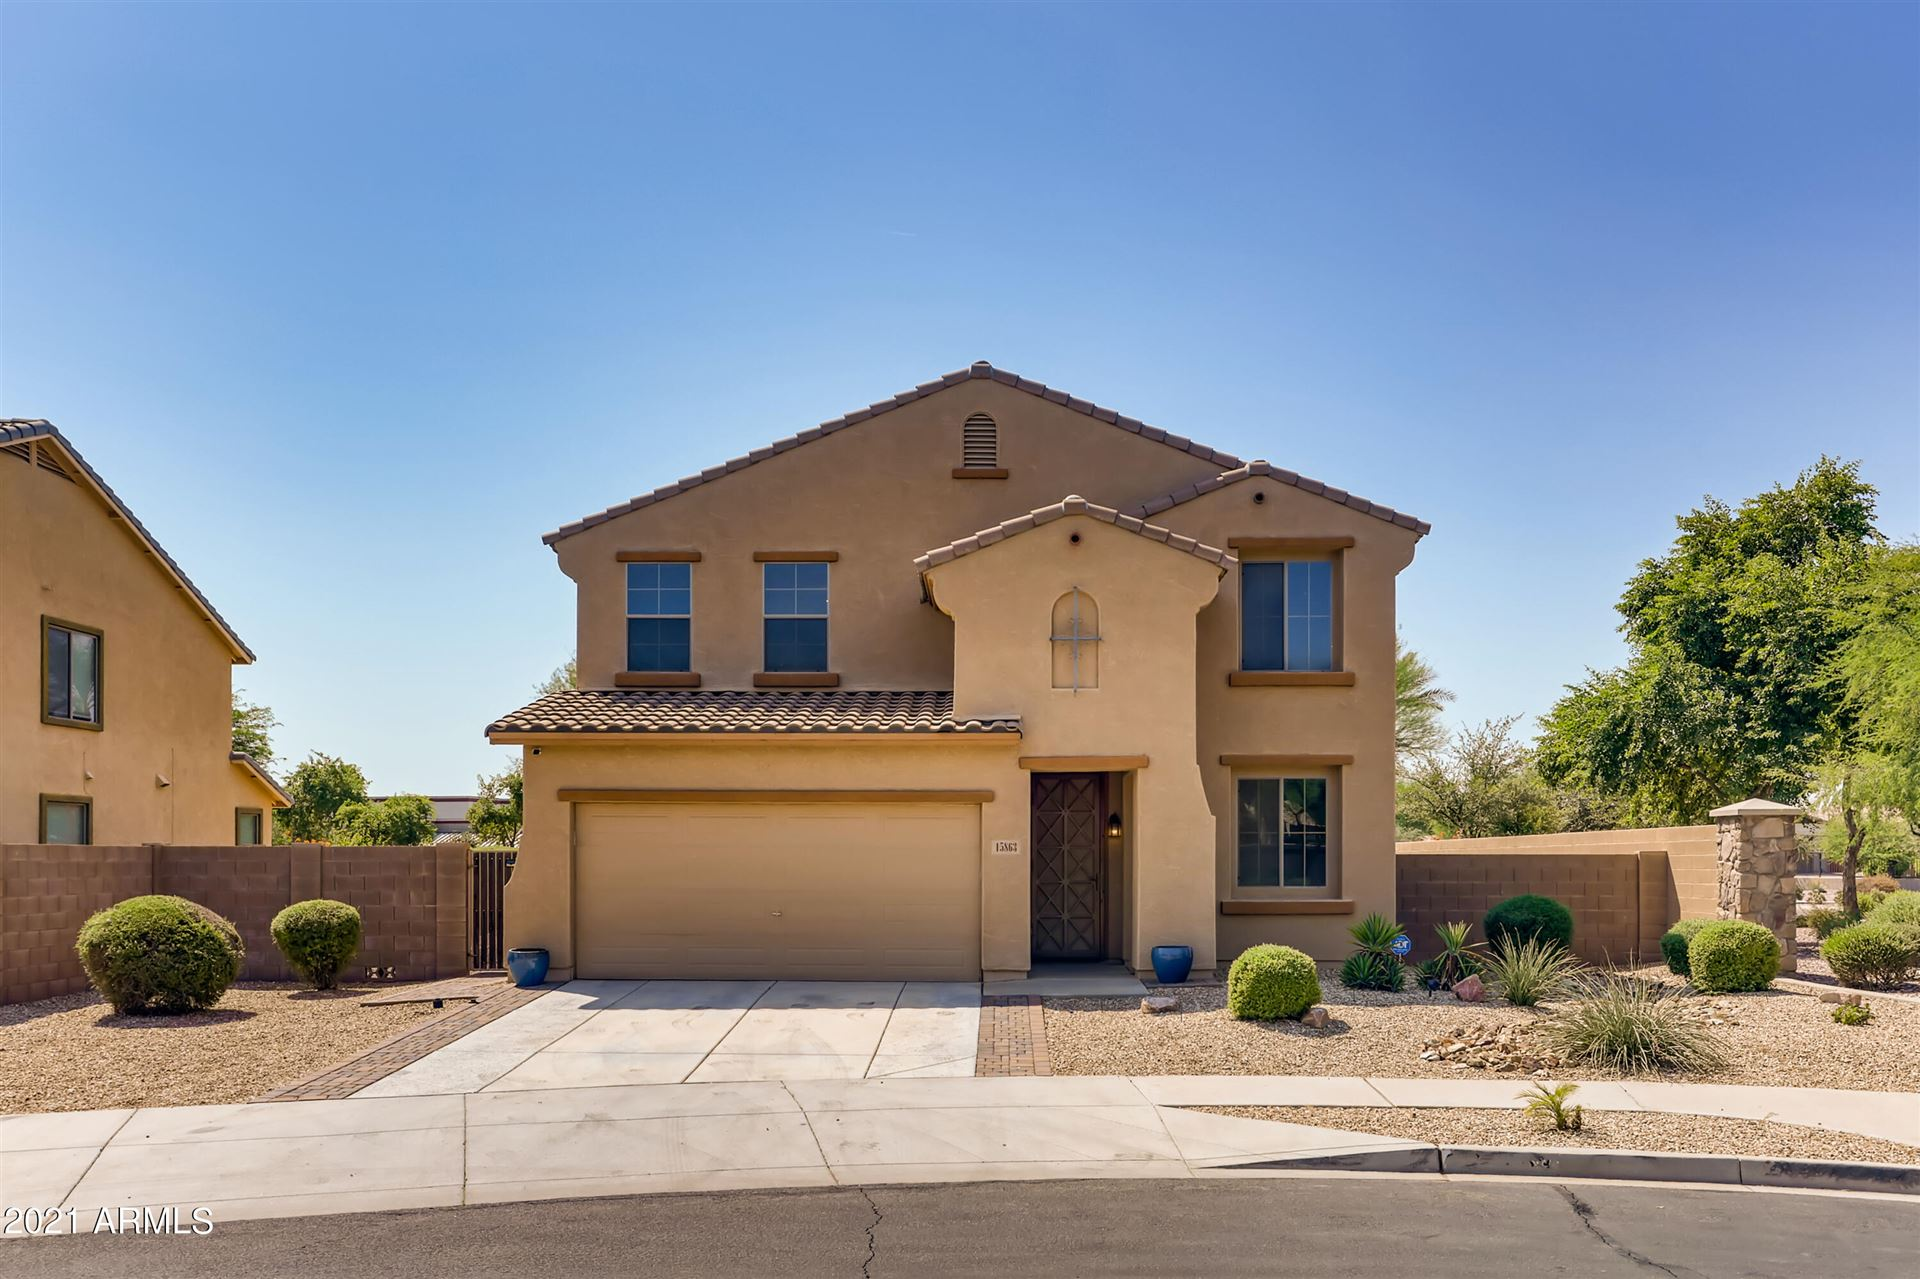 15863 W CORTEZ Street, Surprise, AZ 85379 - MLS#: 6290776